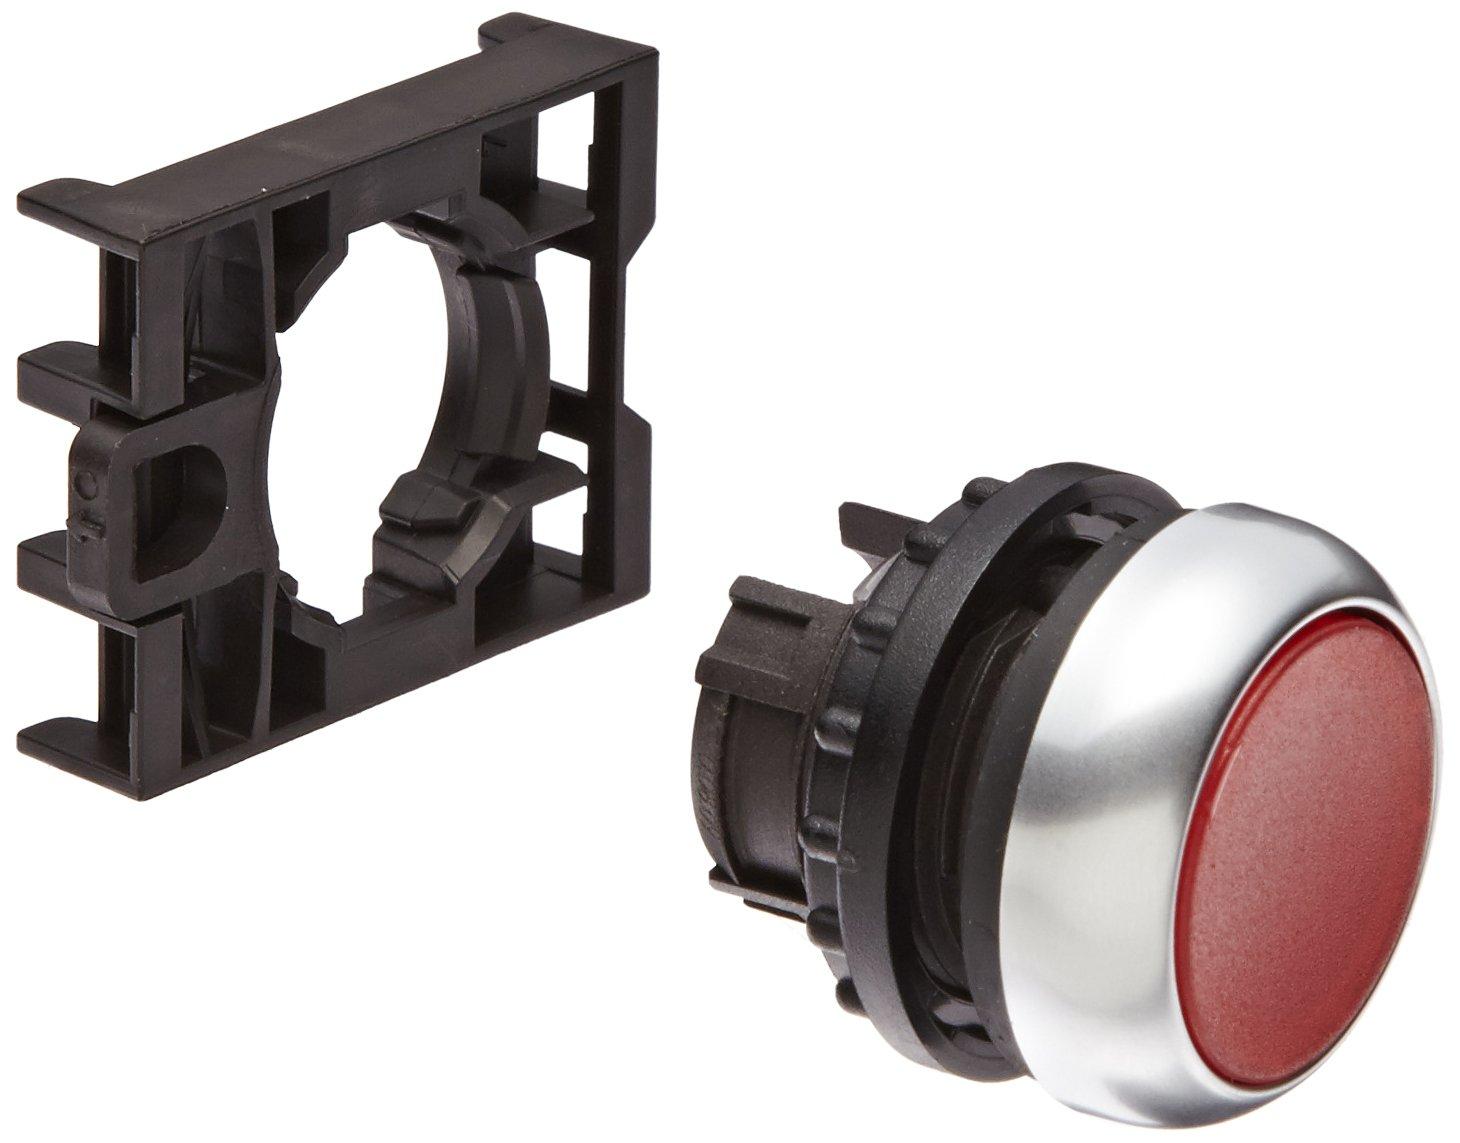 Eaton M22-XGPV Guard Ring for Pushbuttons Yellow 22mm Diameter Buttons